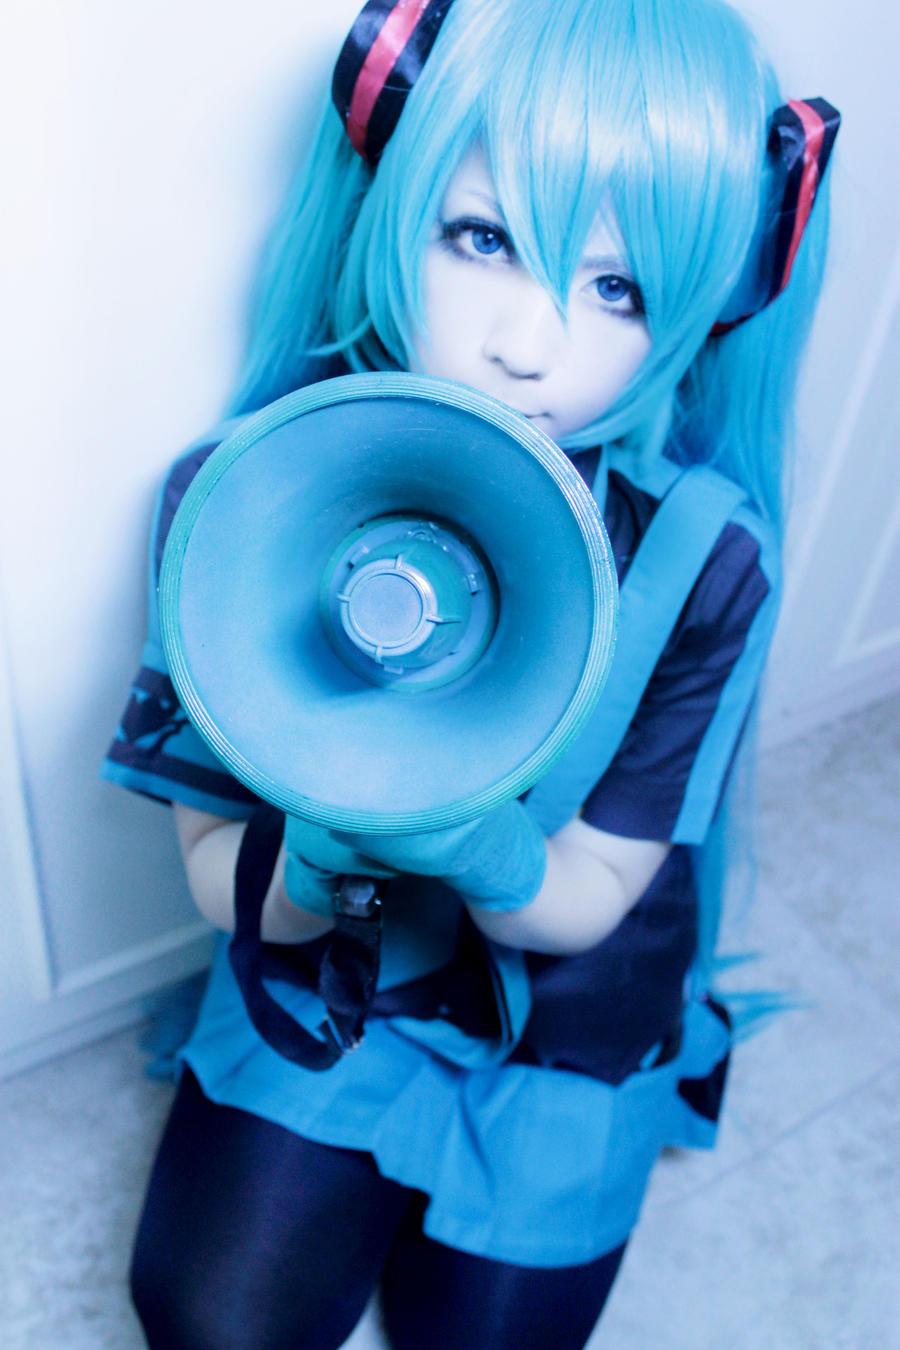 Hatsune miku love is war cosplay